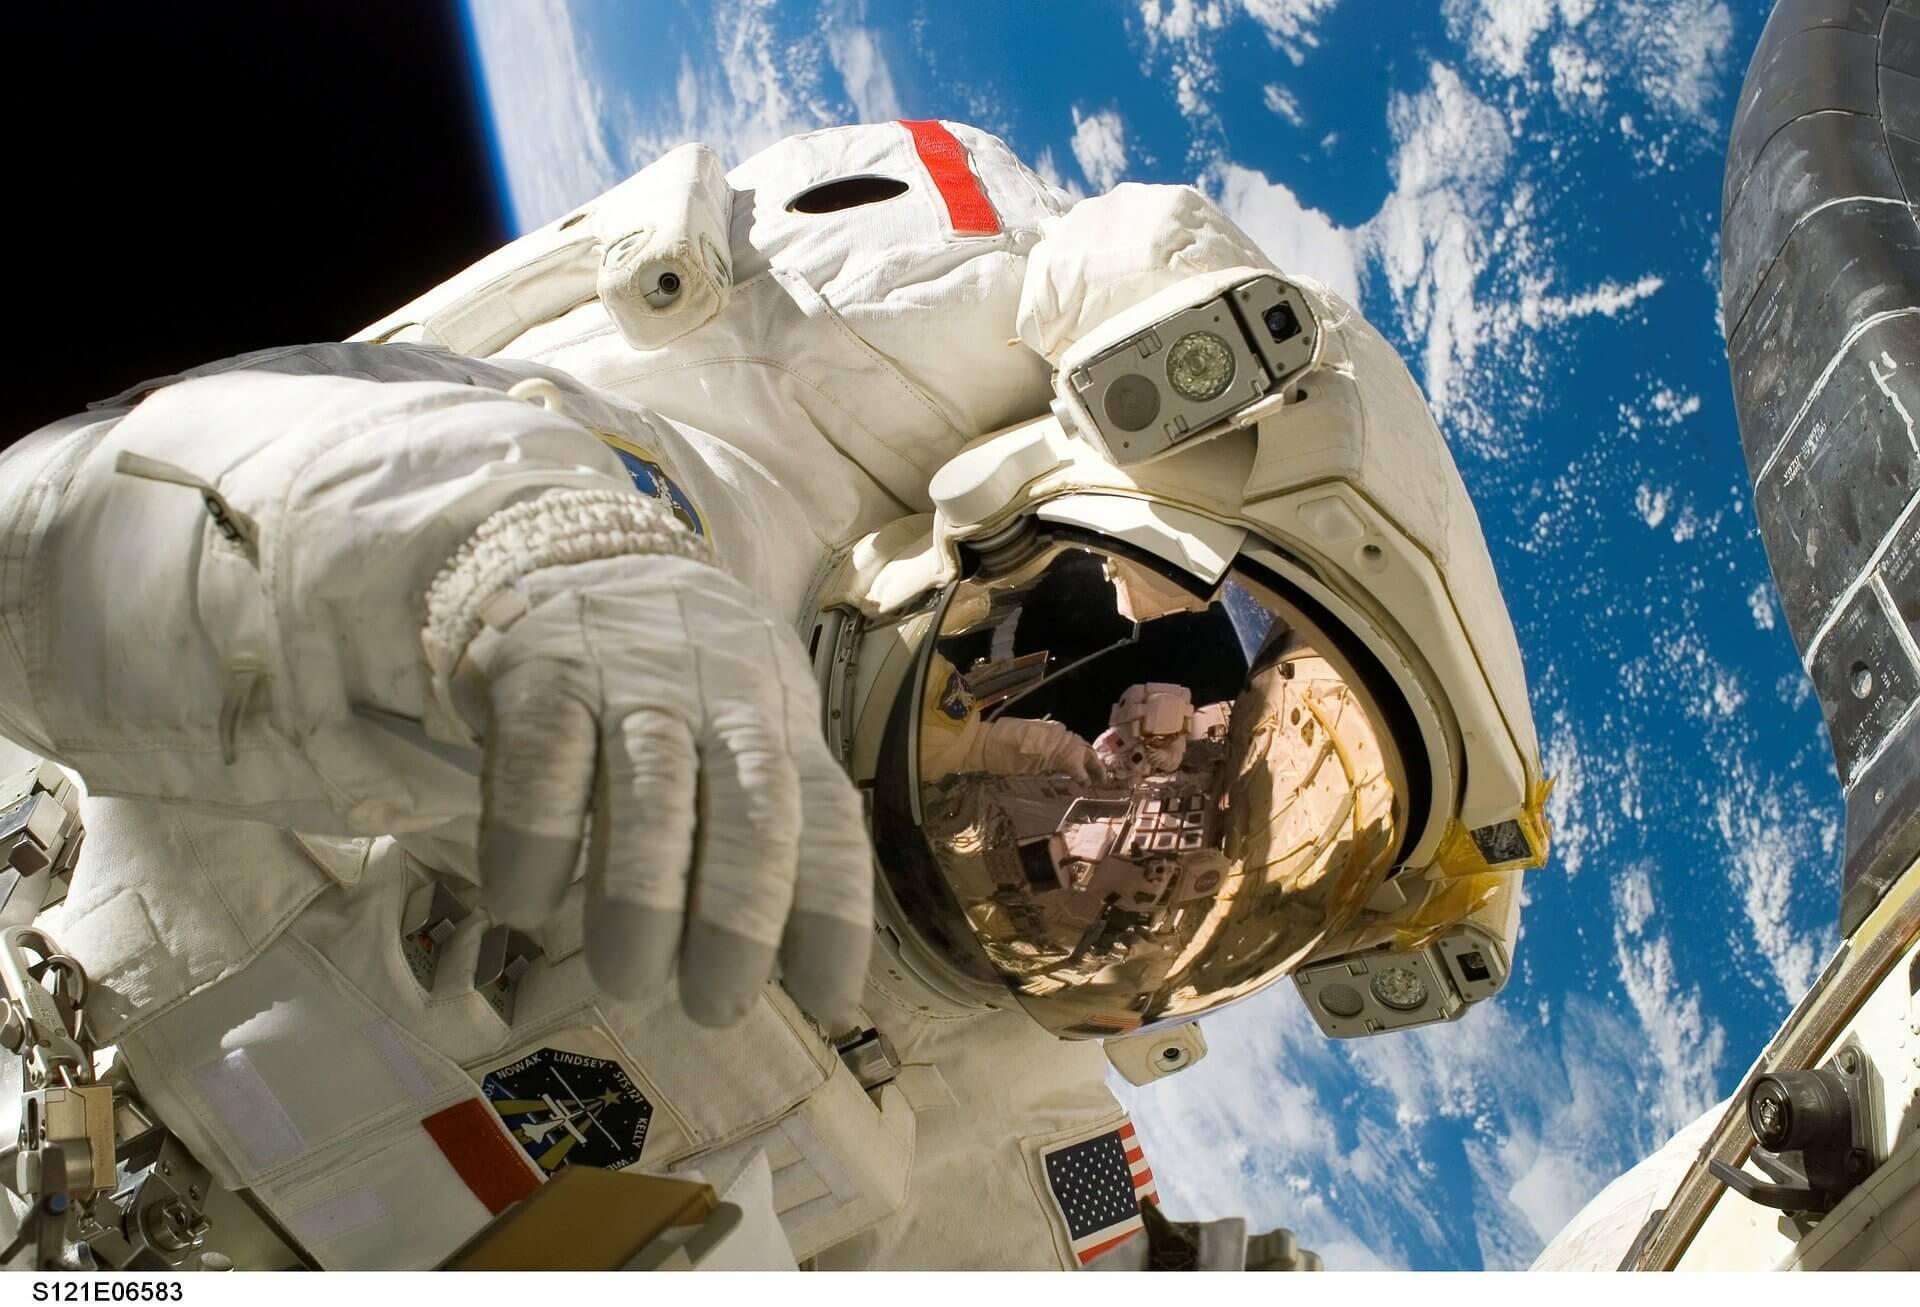 zanimljivosti o svemiru astronaut